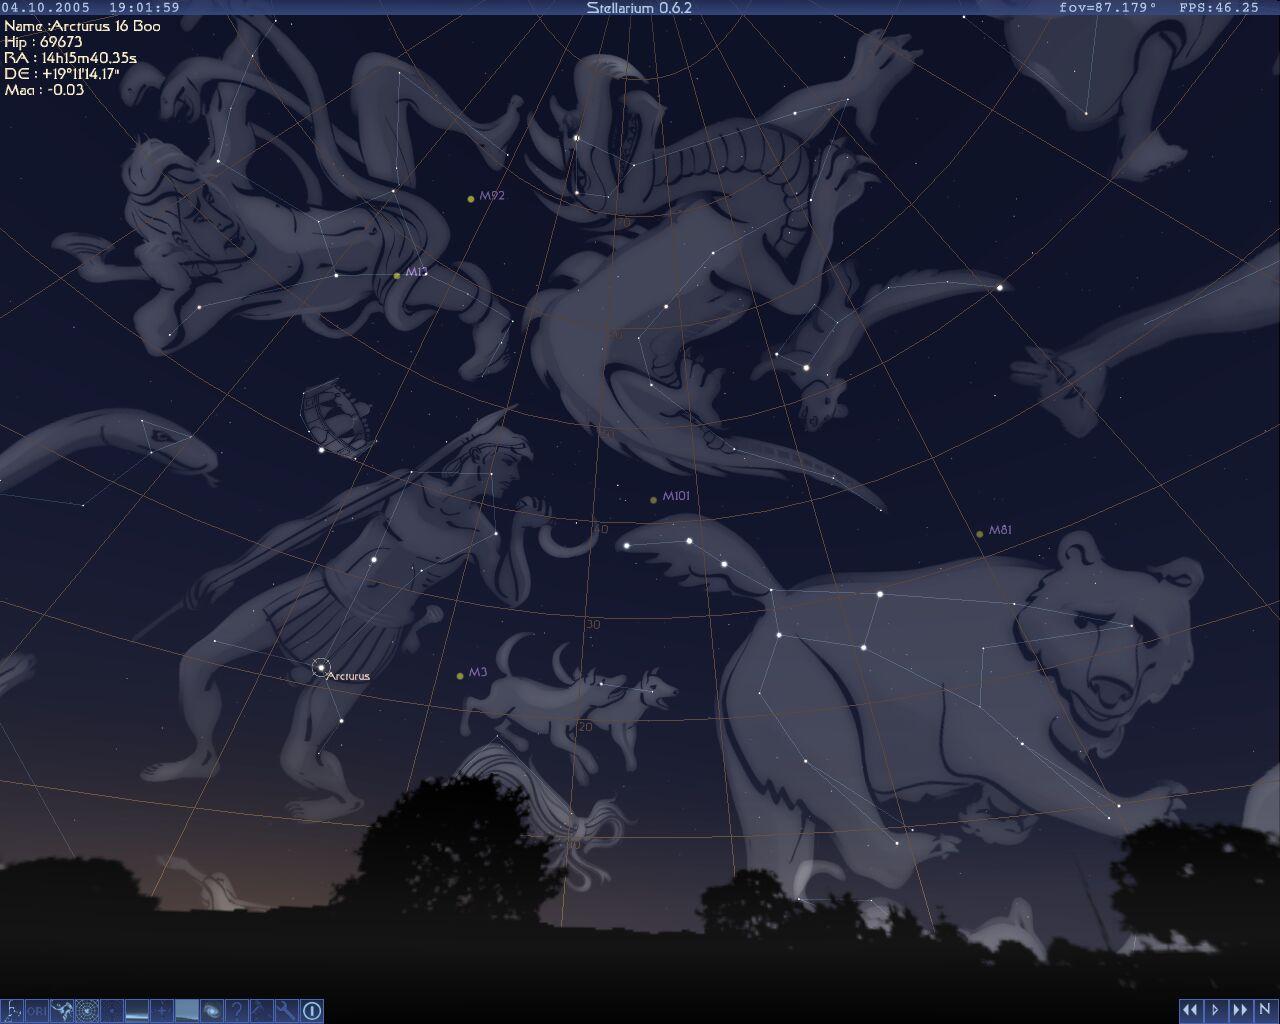 Description Stellarium 001.jpg